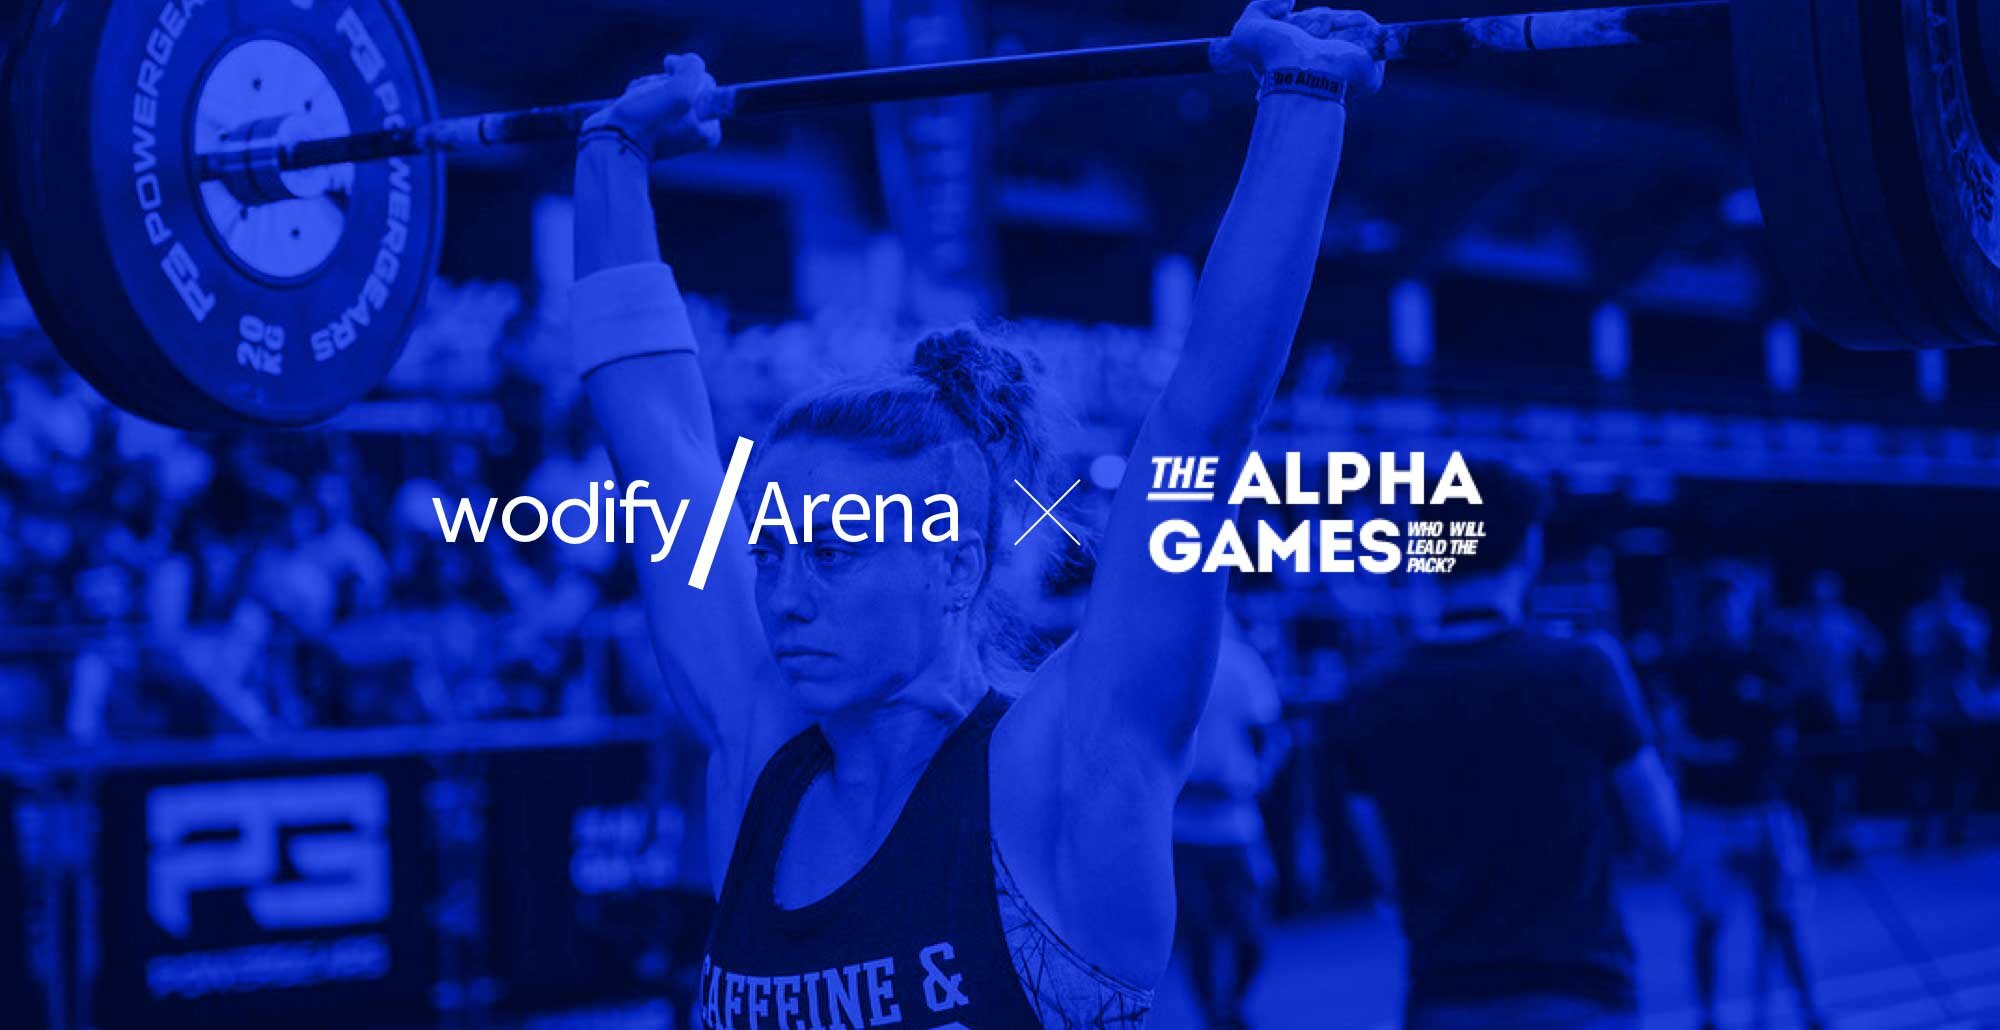 Wodify Arena x Alpha Games